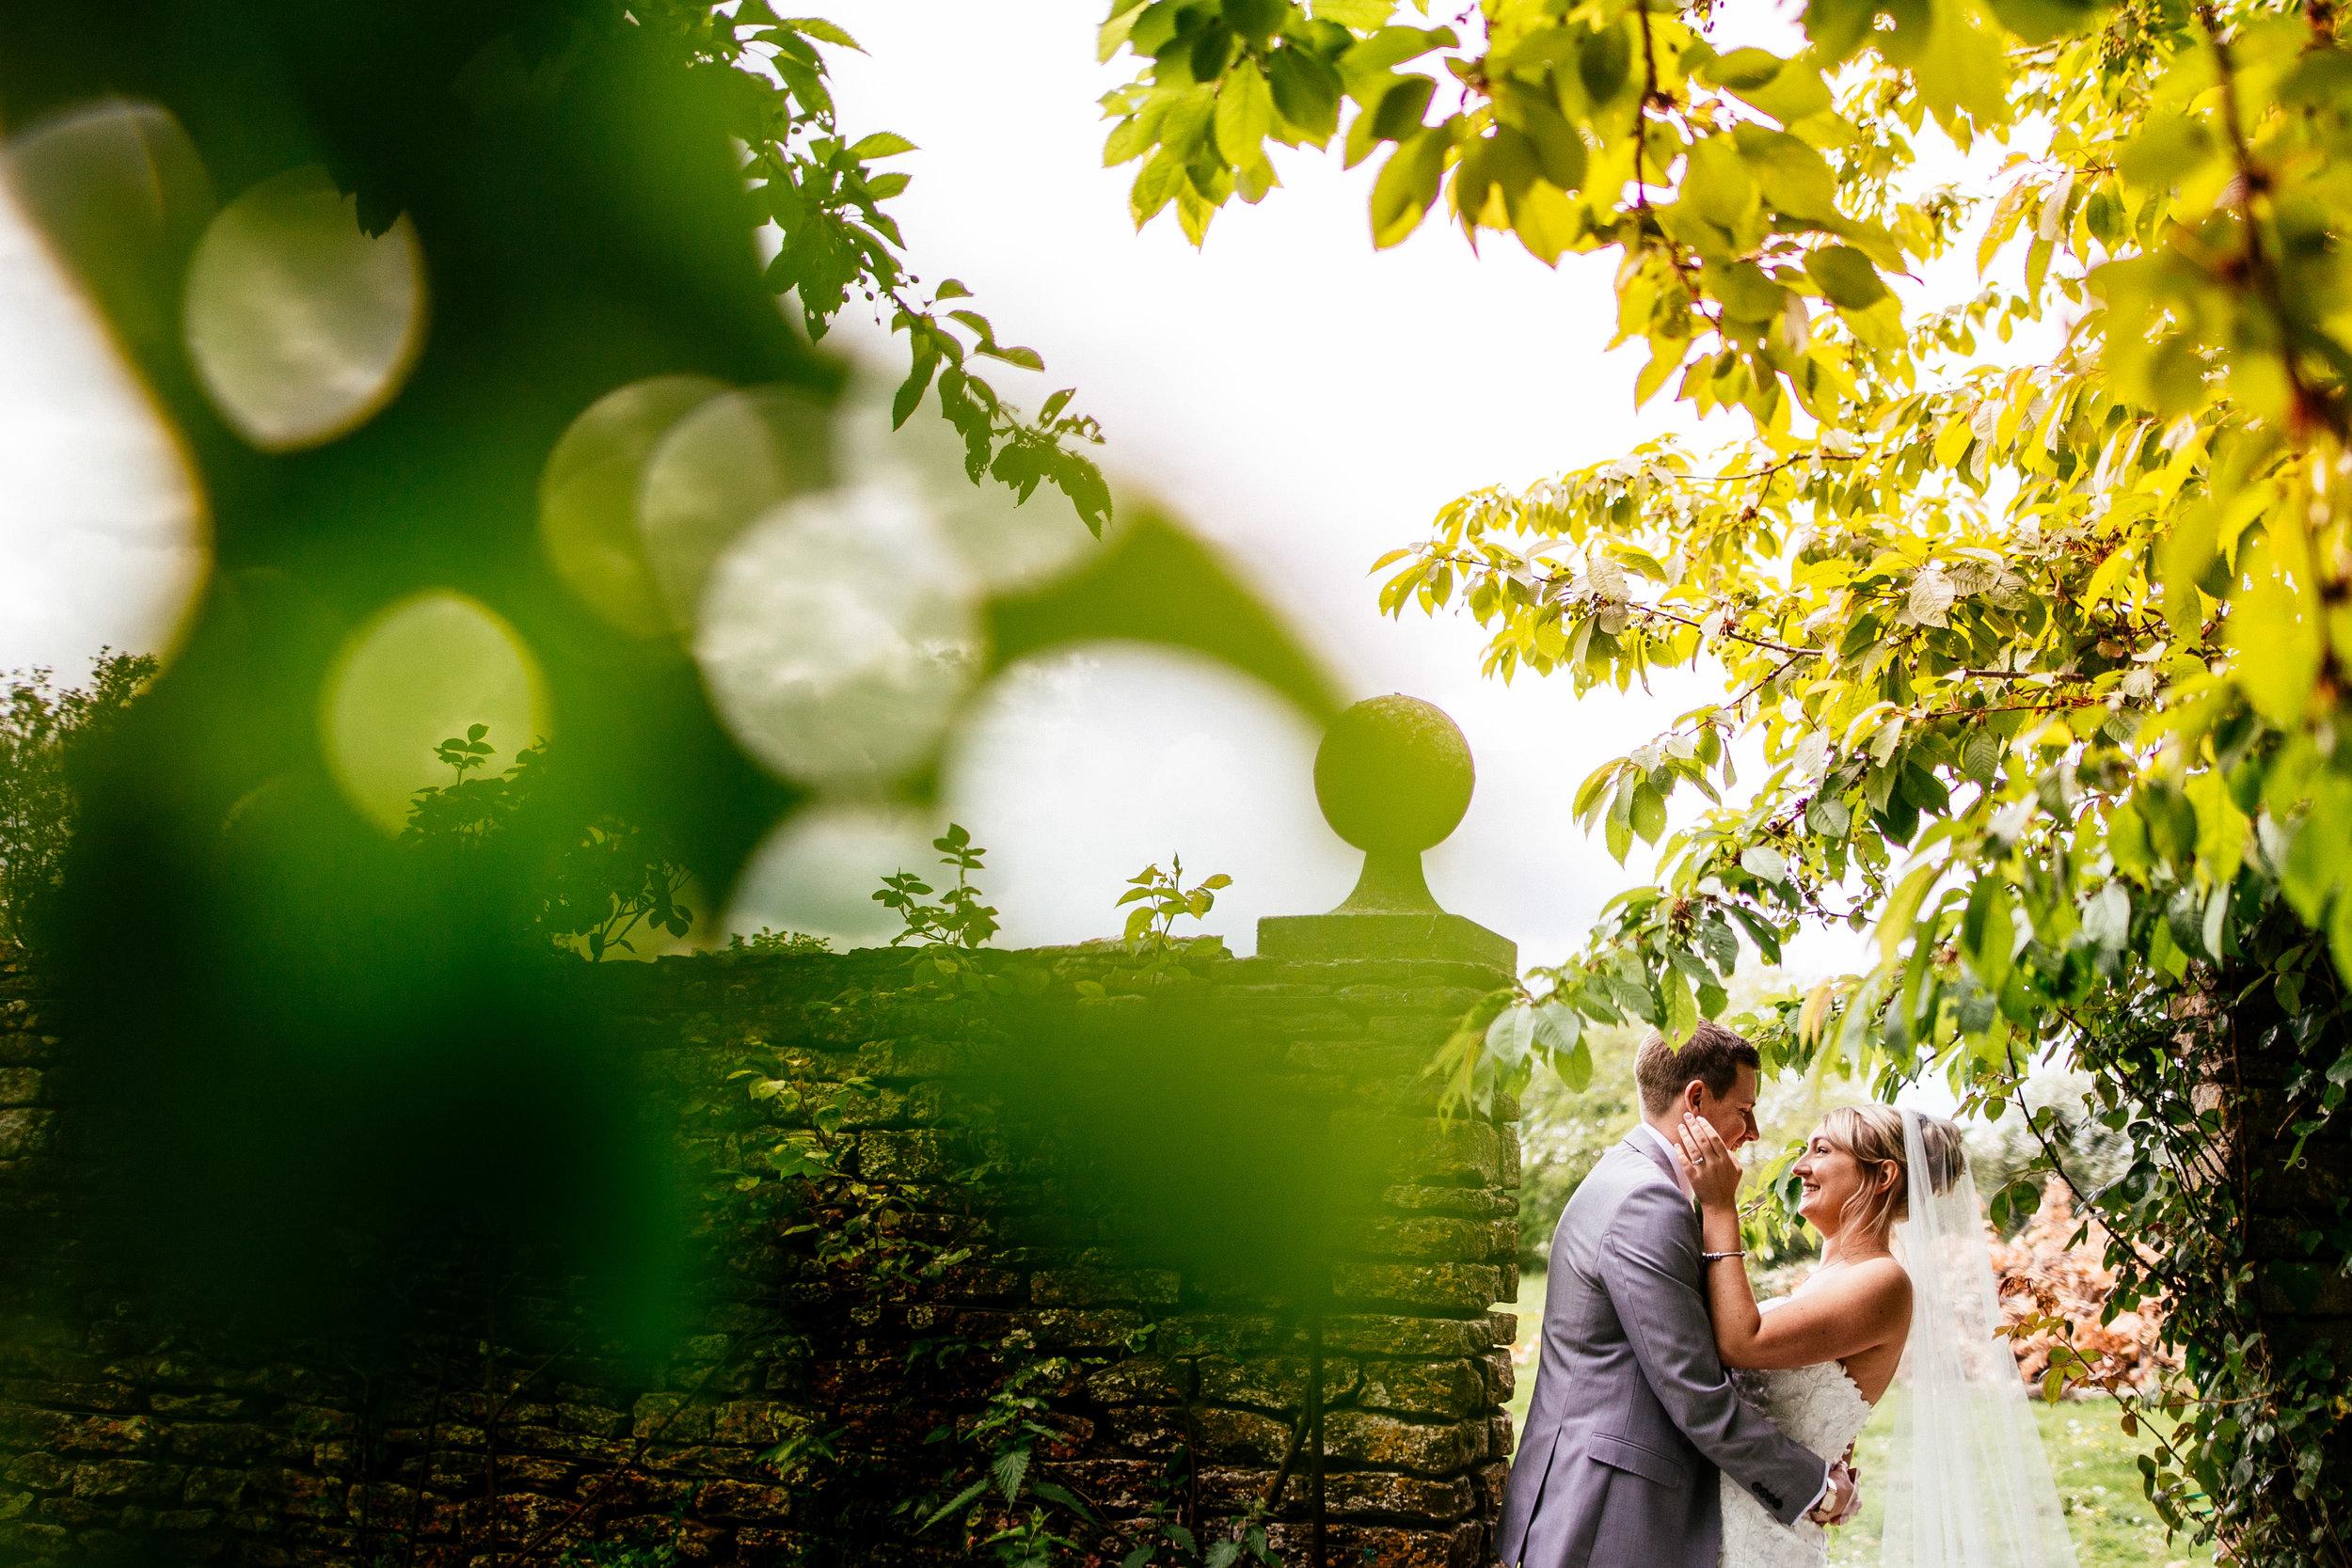 Becky-and-Sam-Wedding-Highlights-54.jpg